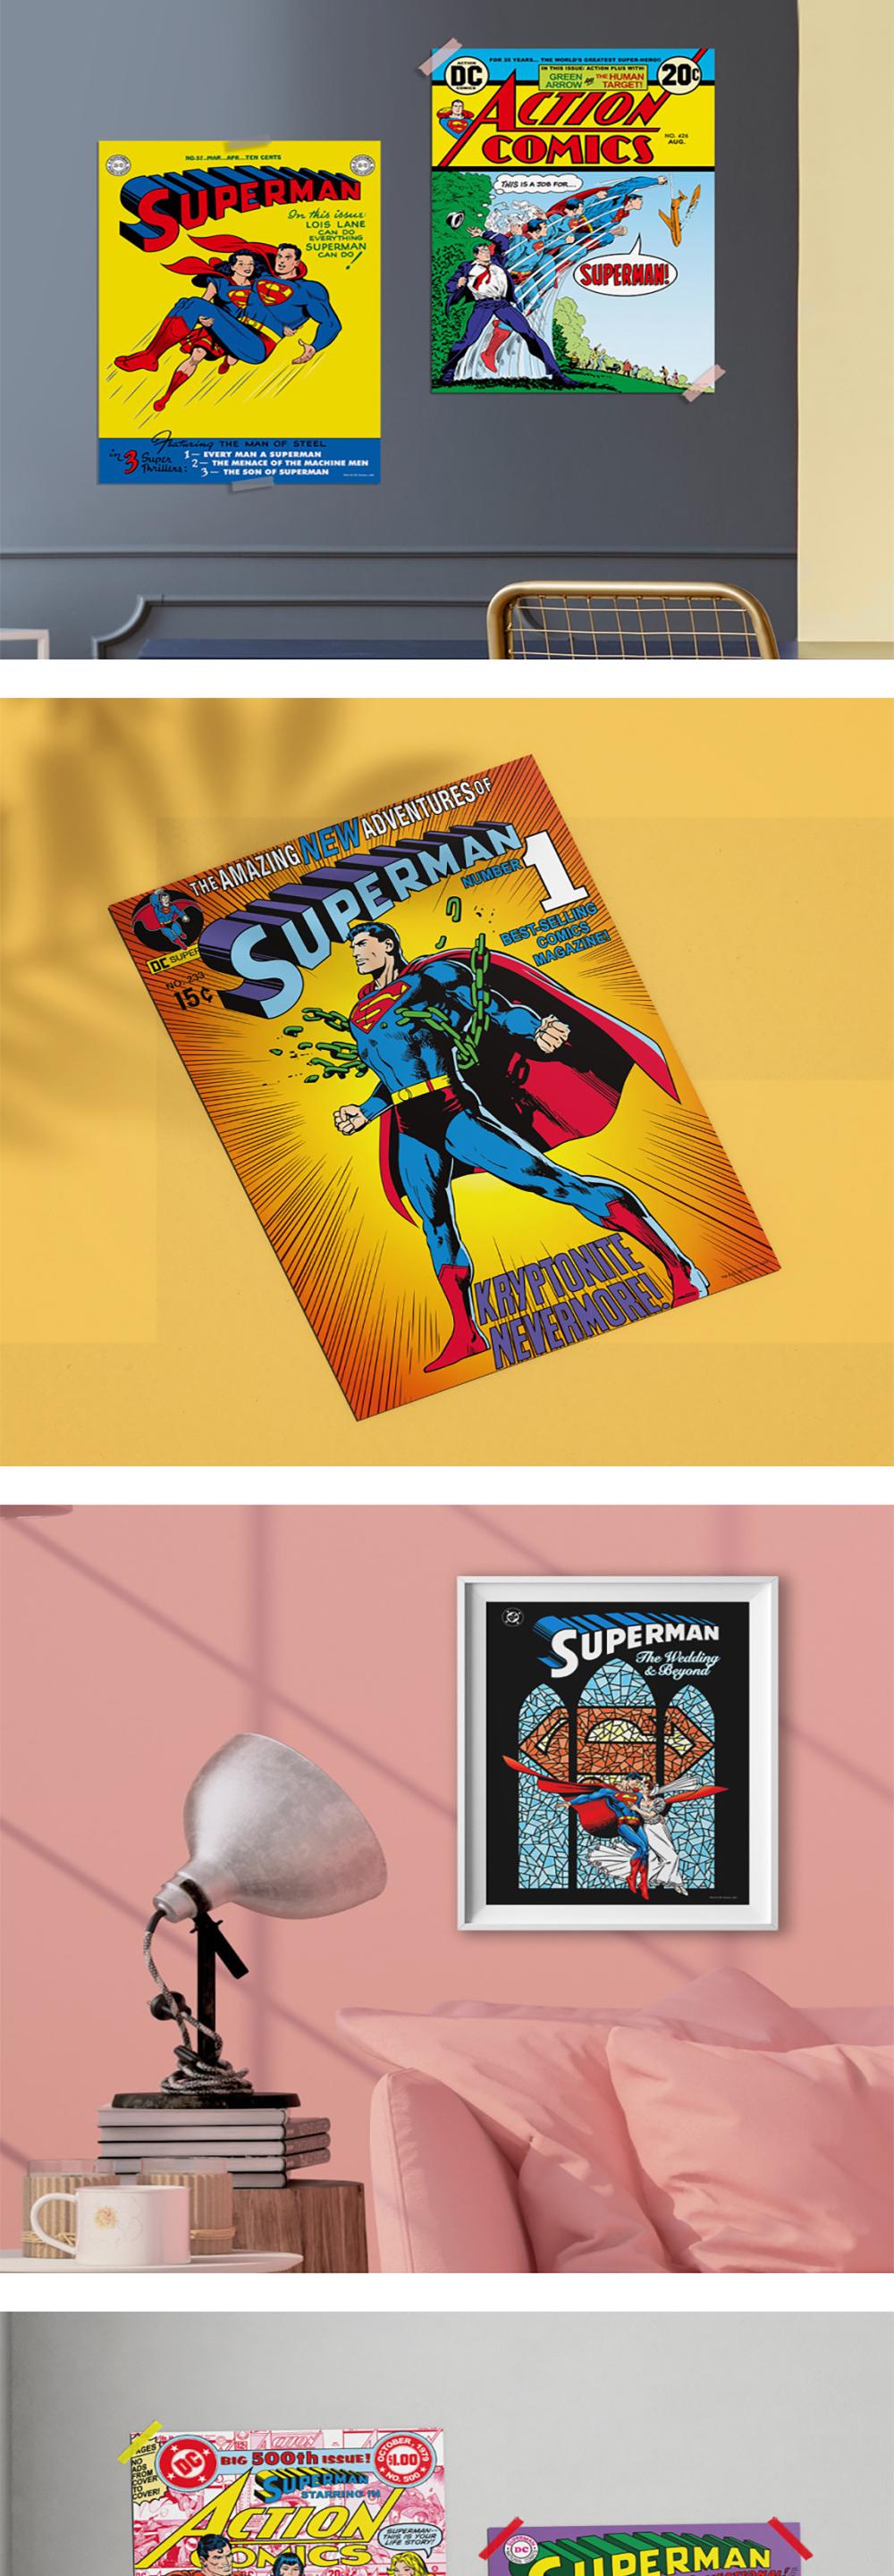 DC코믹스 인테리어 포스터_슈퍼맨_04.jpg